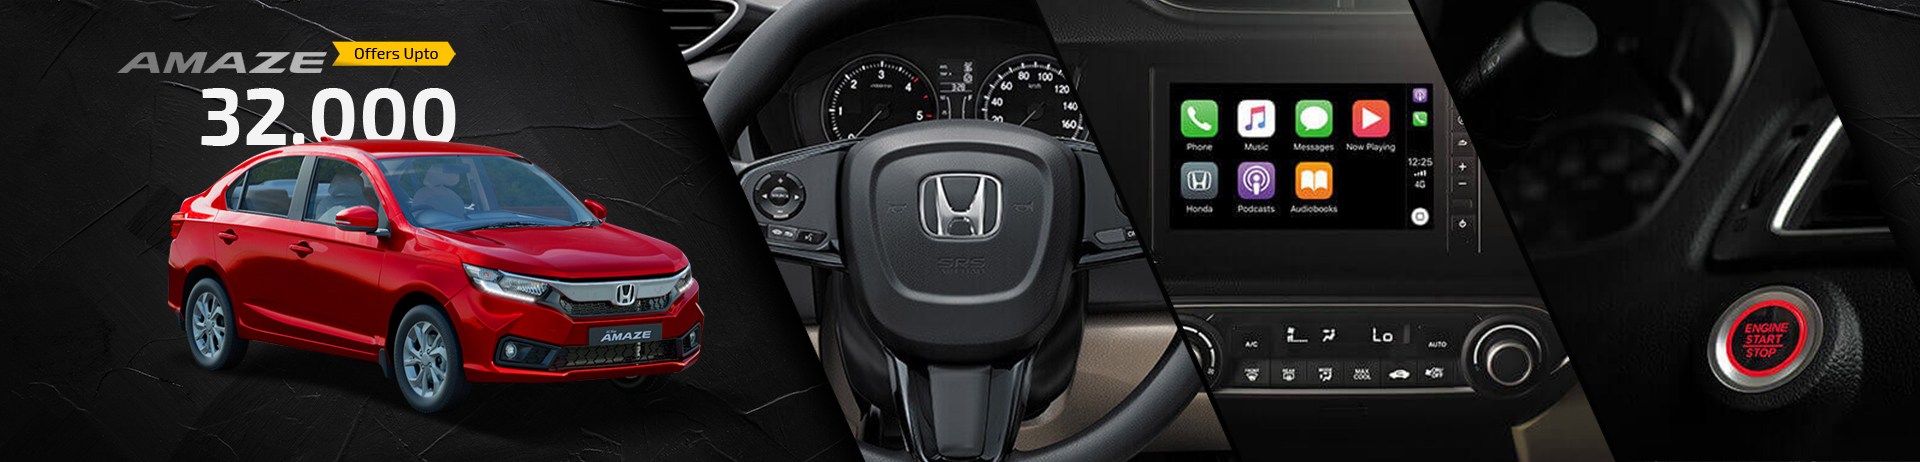 Honda-amaze-offer